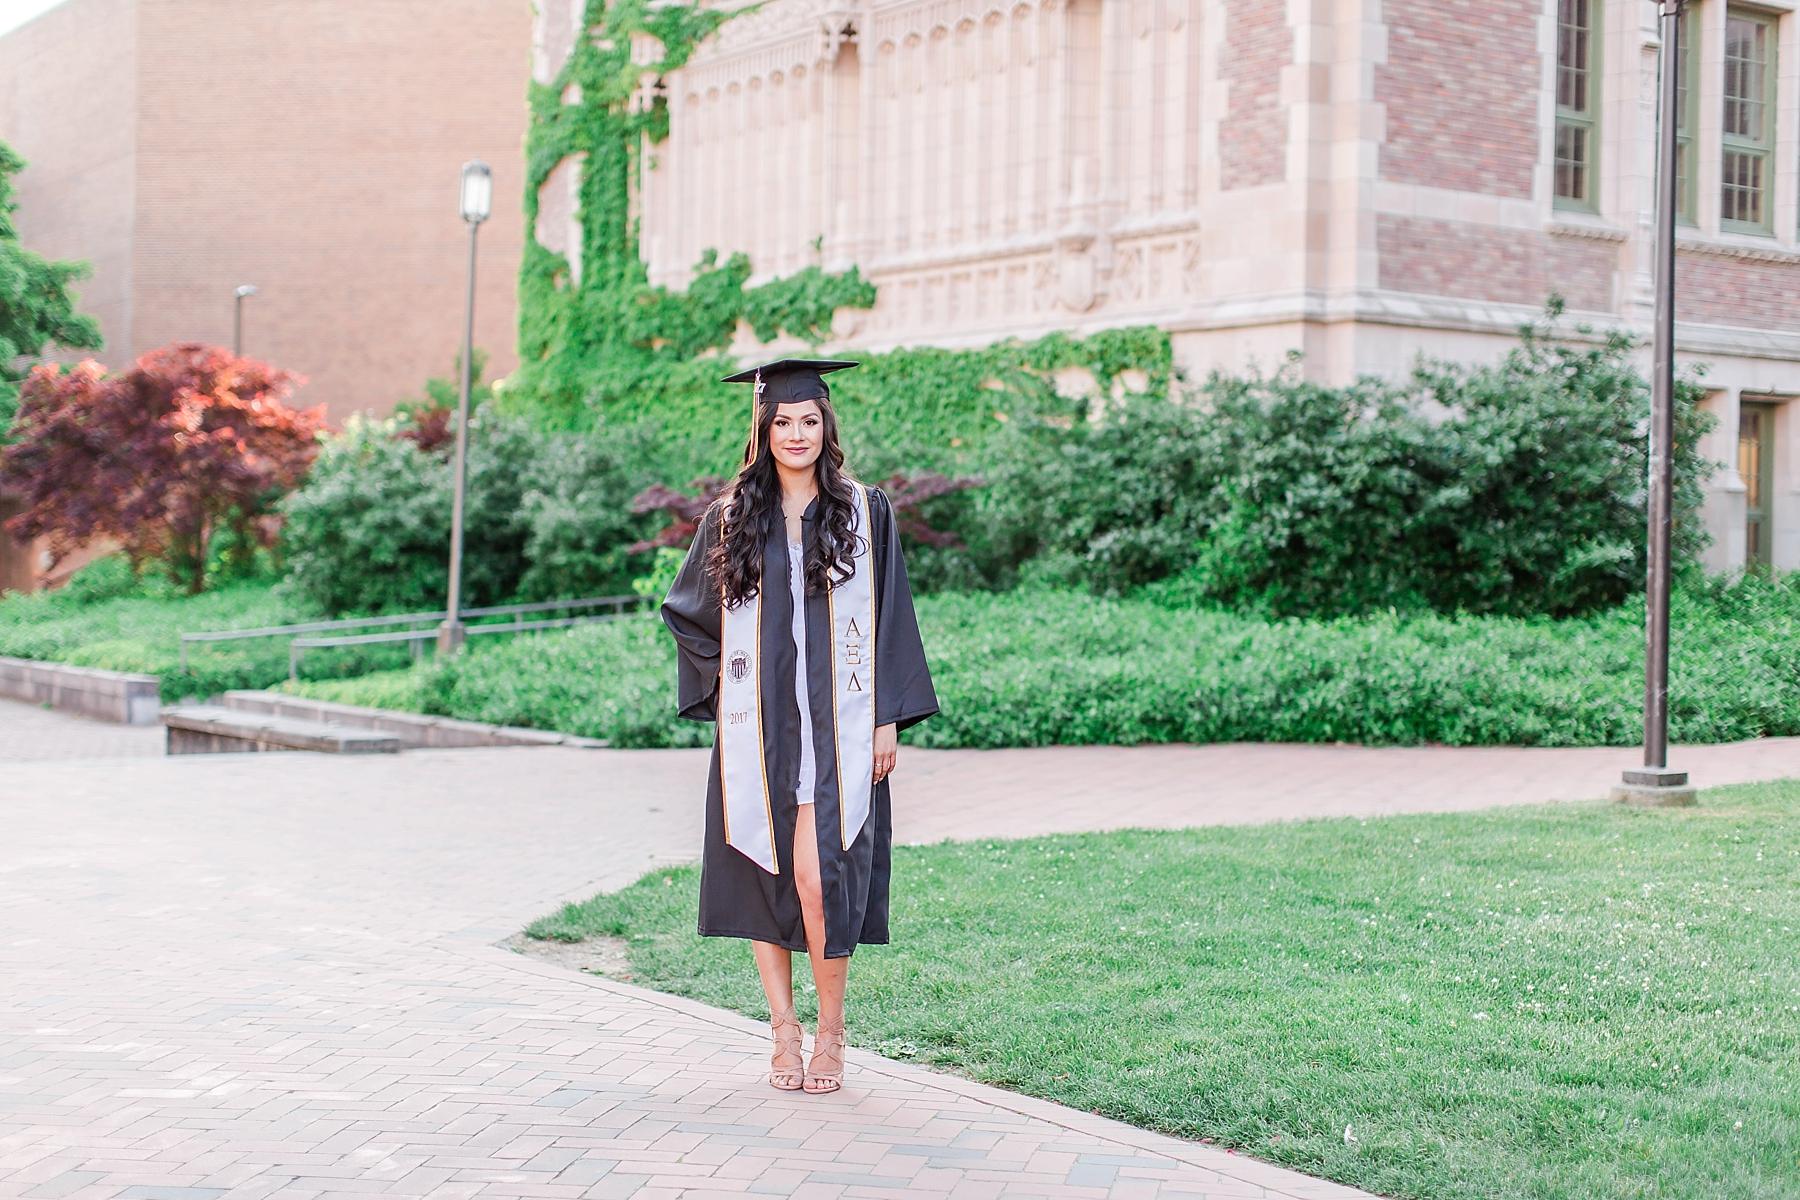 university-of-washington-seattle-senior-graduation-photos_0370.jpg